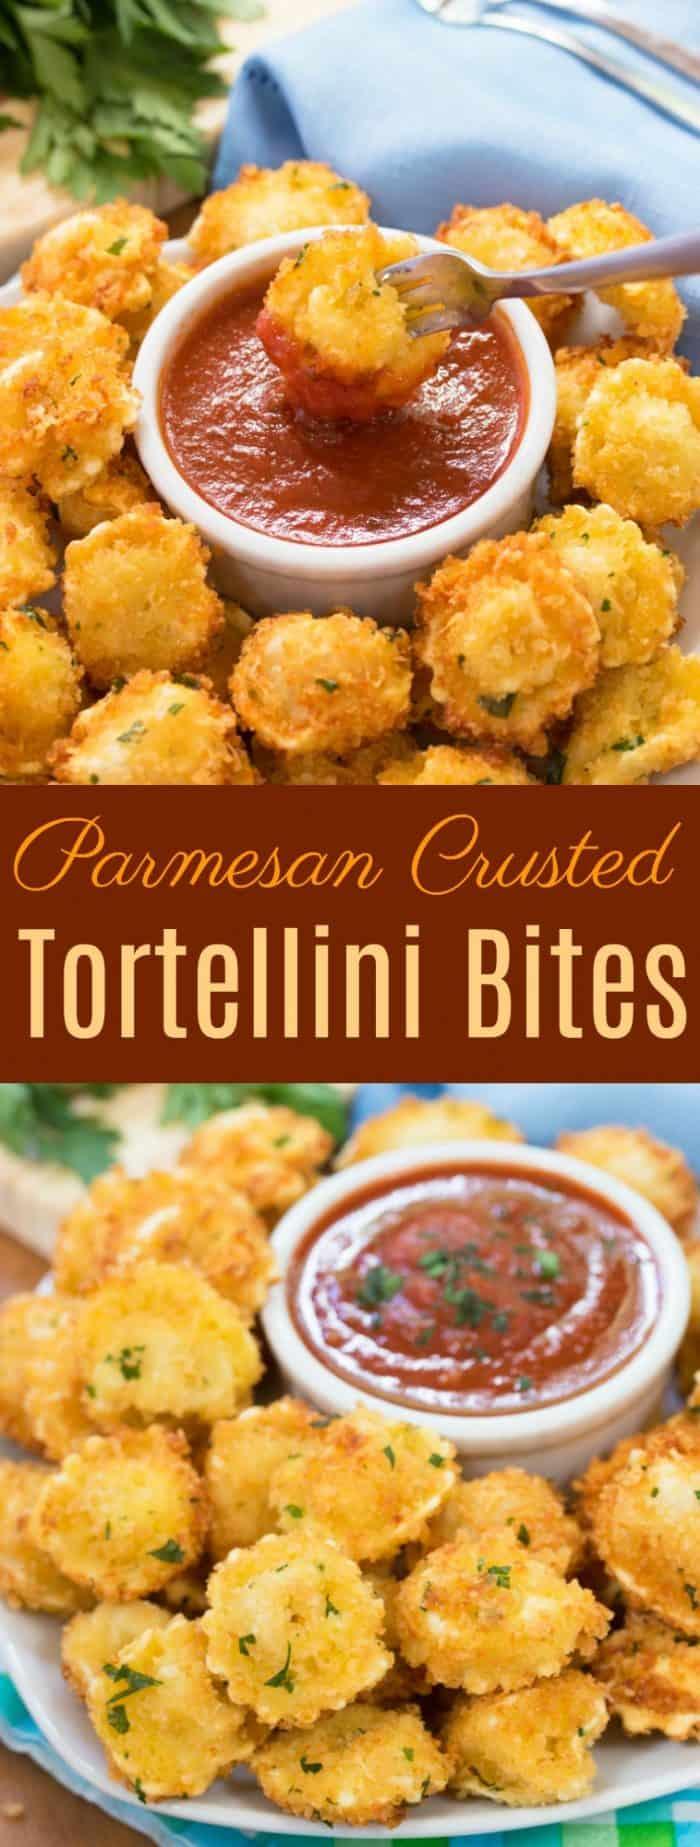 Parmesan Crusted Tortellini Bites